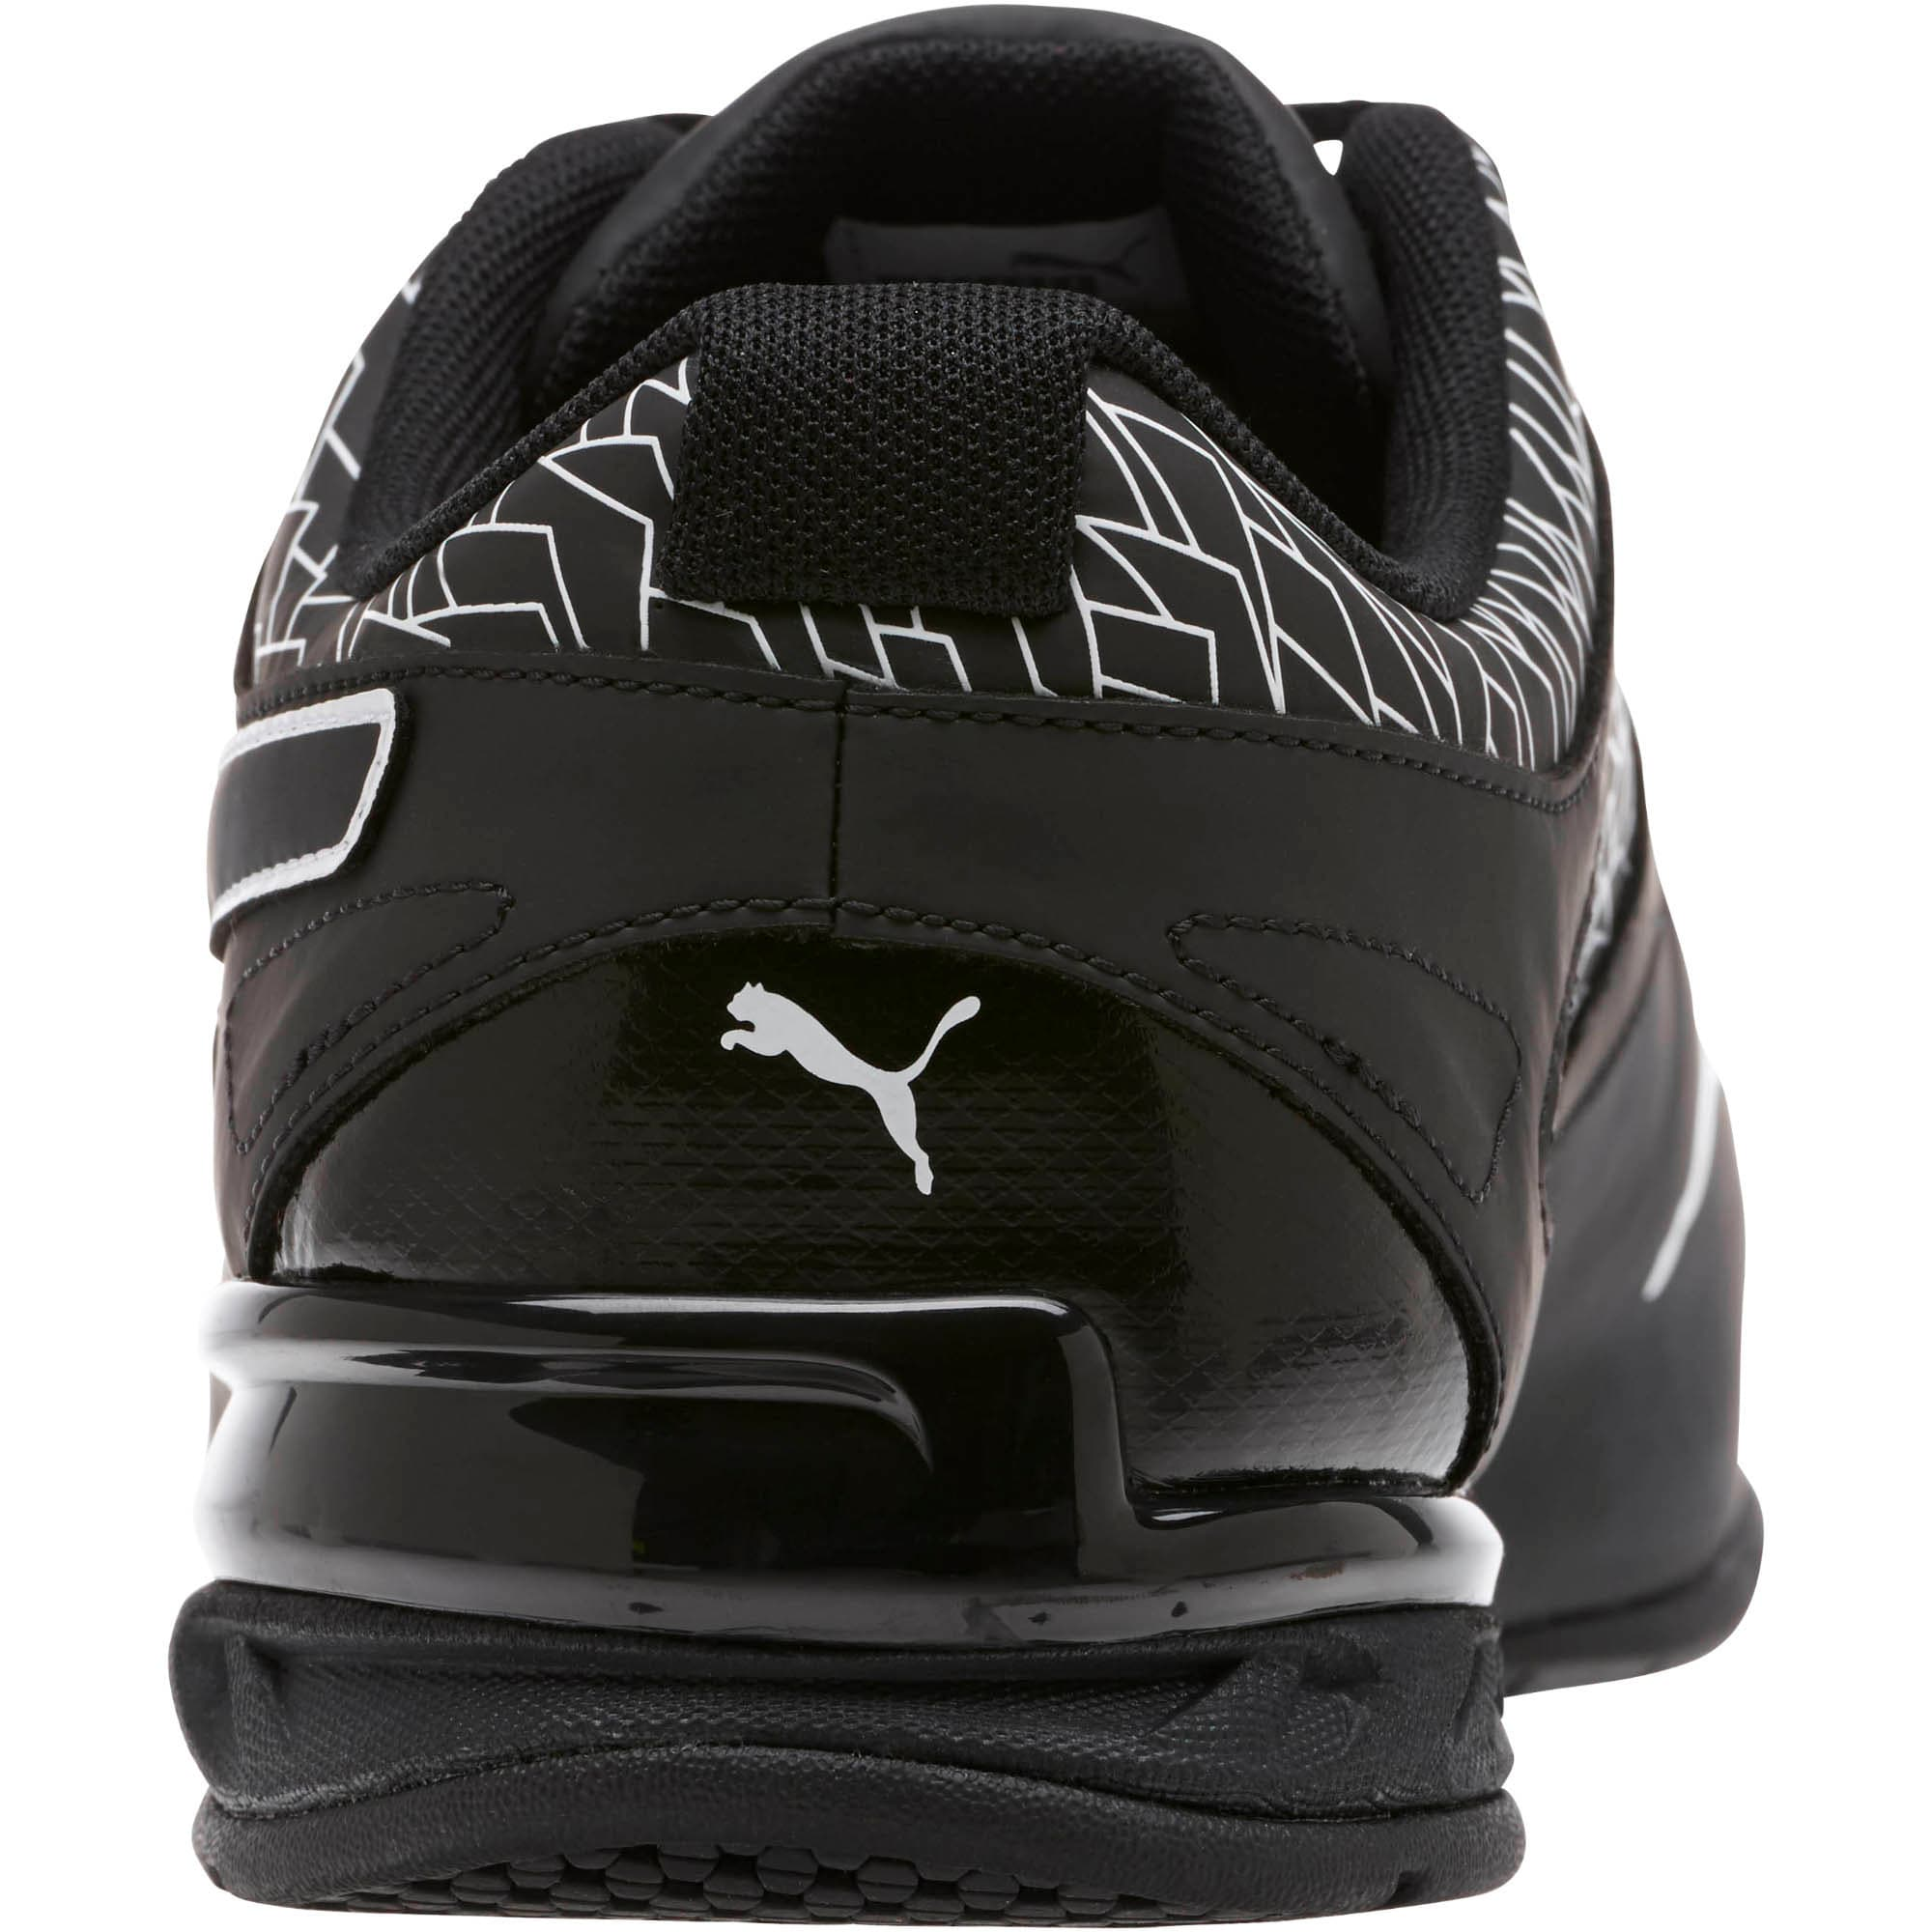 Thumbnail 4 of Tazon 6 Fracture FM Wide Men's Sneakers, Puma Black-Puma Black, medium